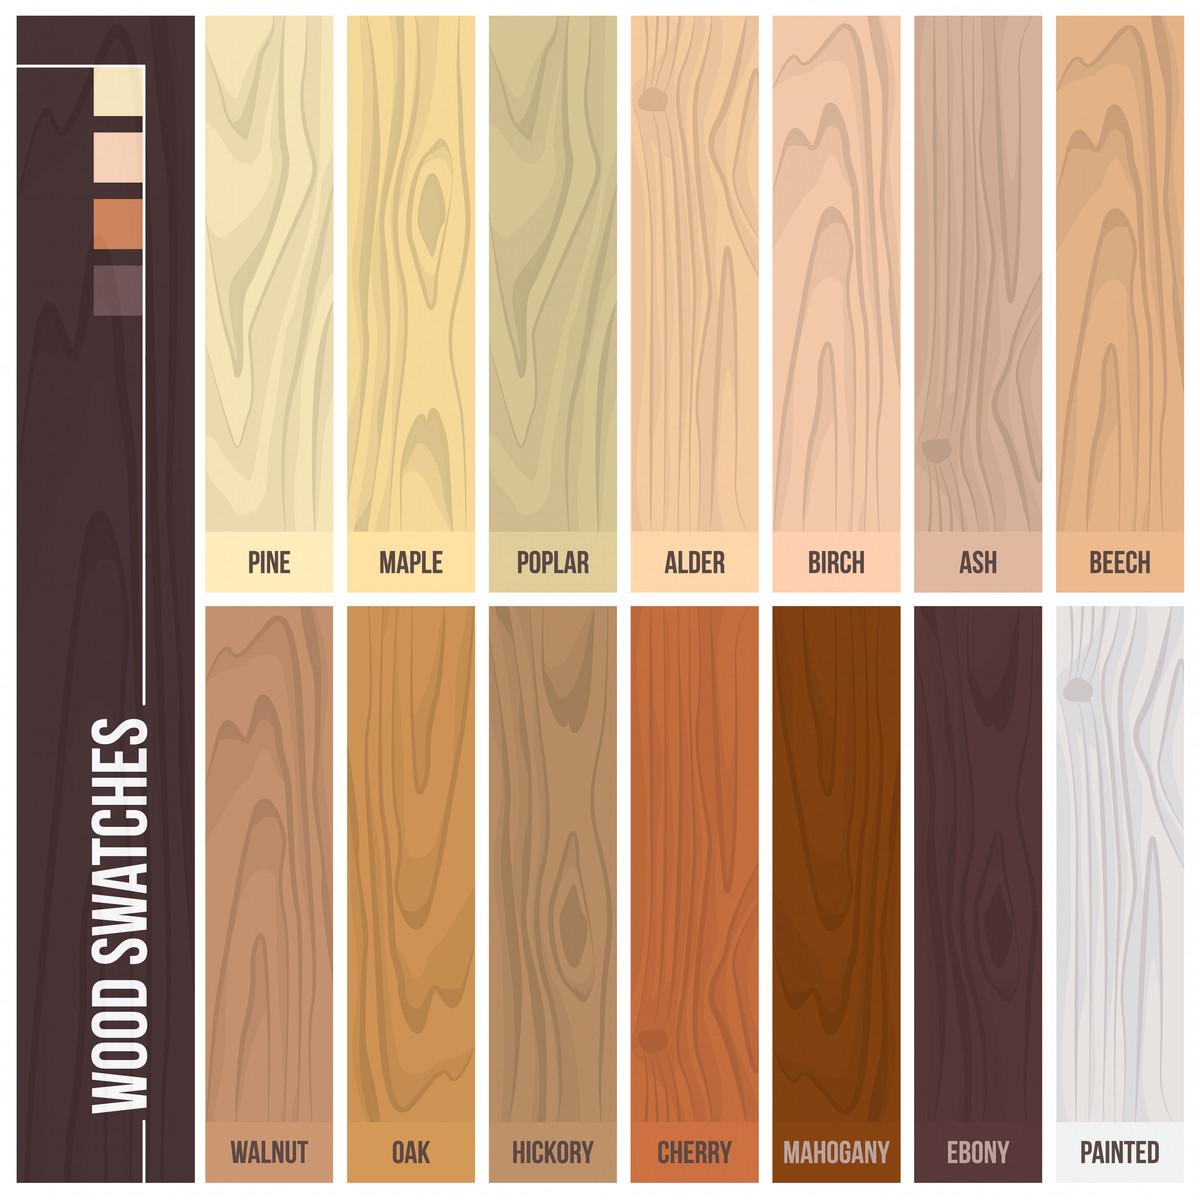 white oak hardwood flooring for sale of 12 types of hardwood flooring species styles edging dimensions with types of hardwood flooring illustrated guide